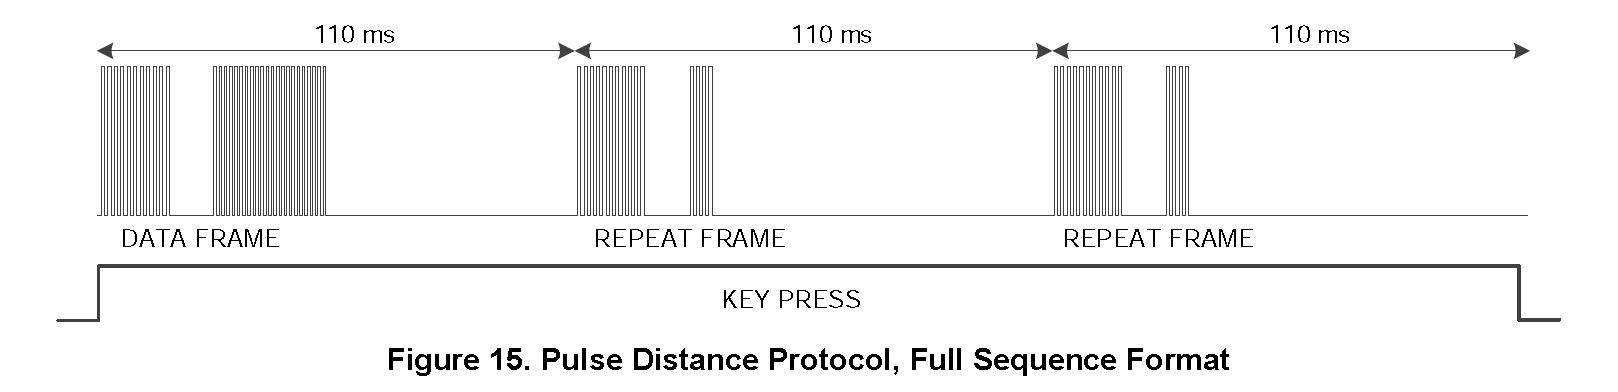 Figure15